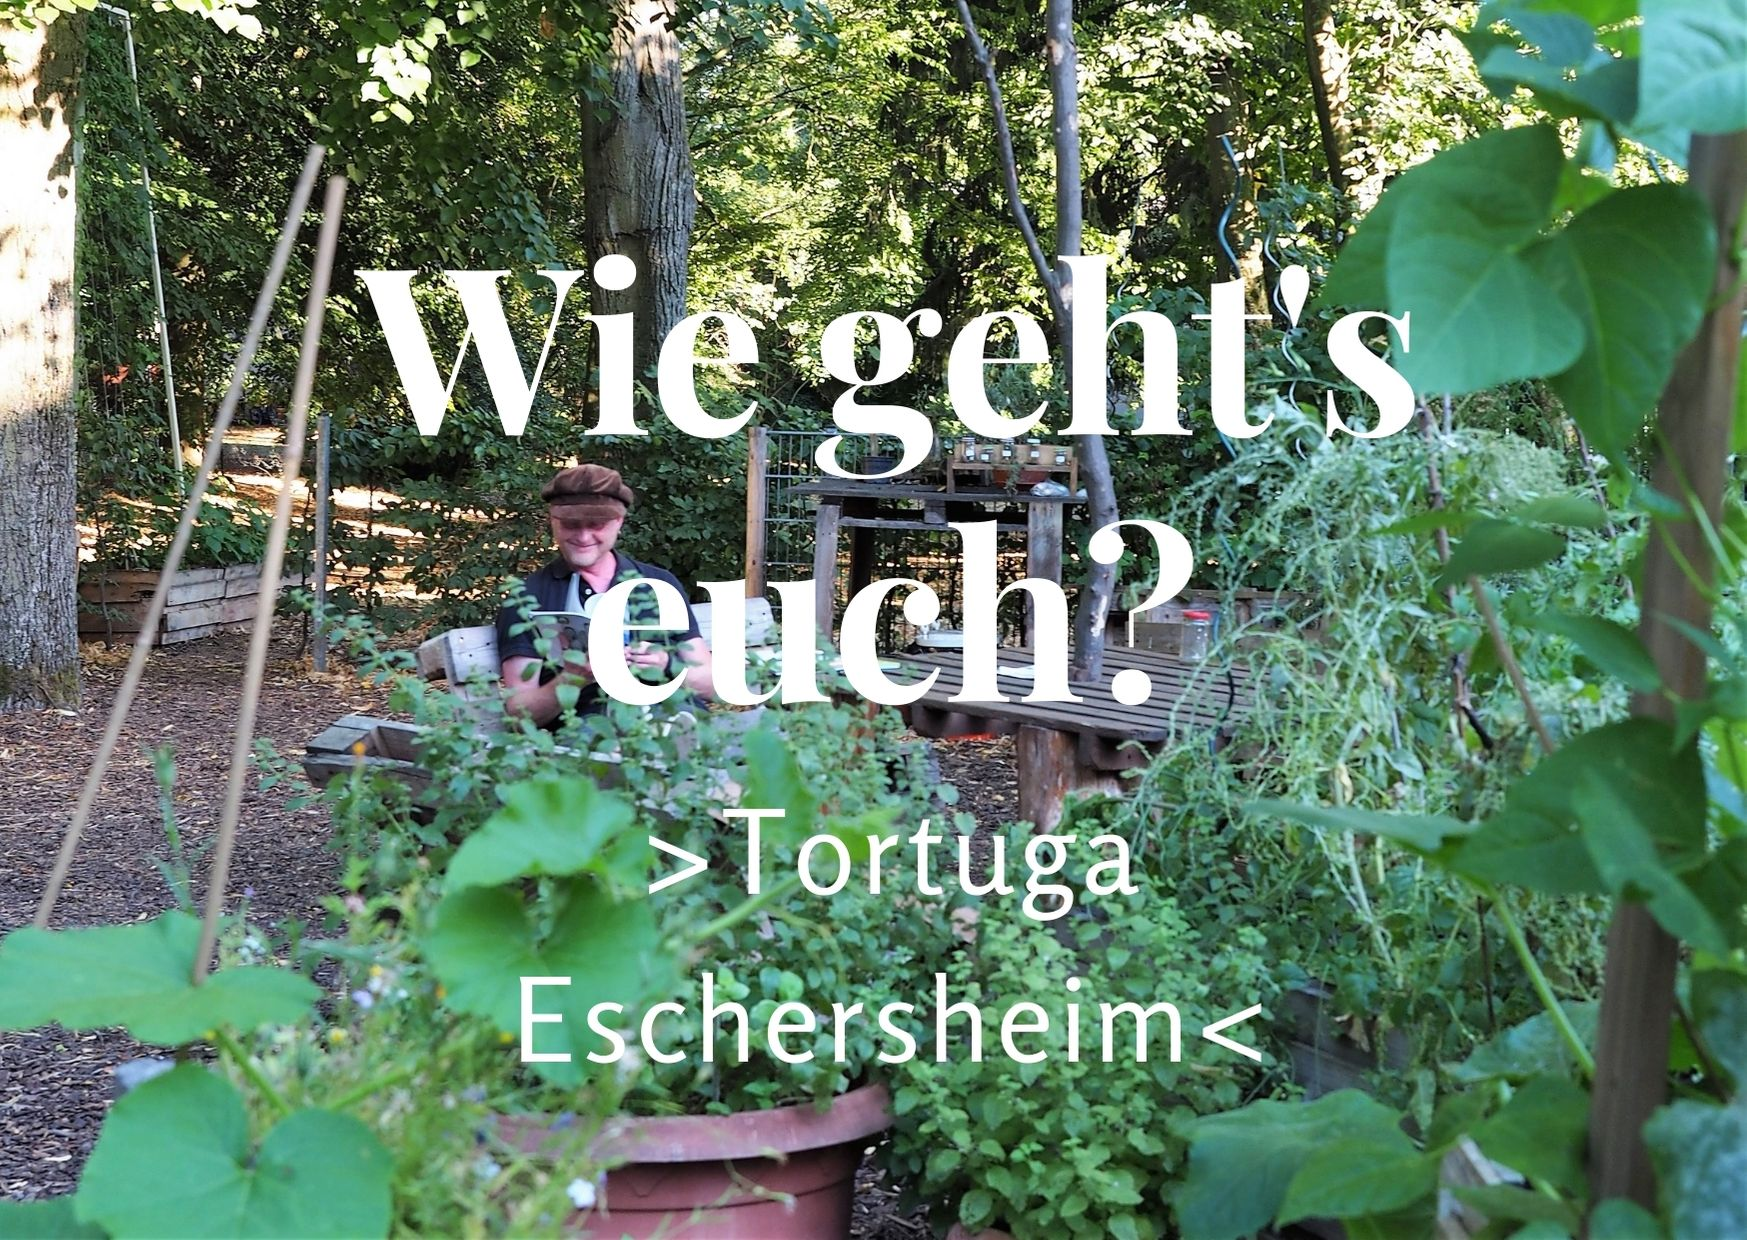 Gemeinschaftsgarten Tortuga in Frankfurt